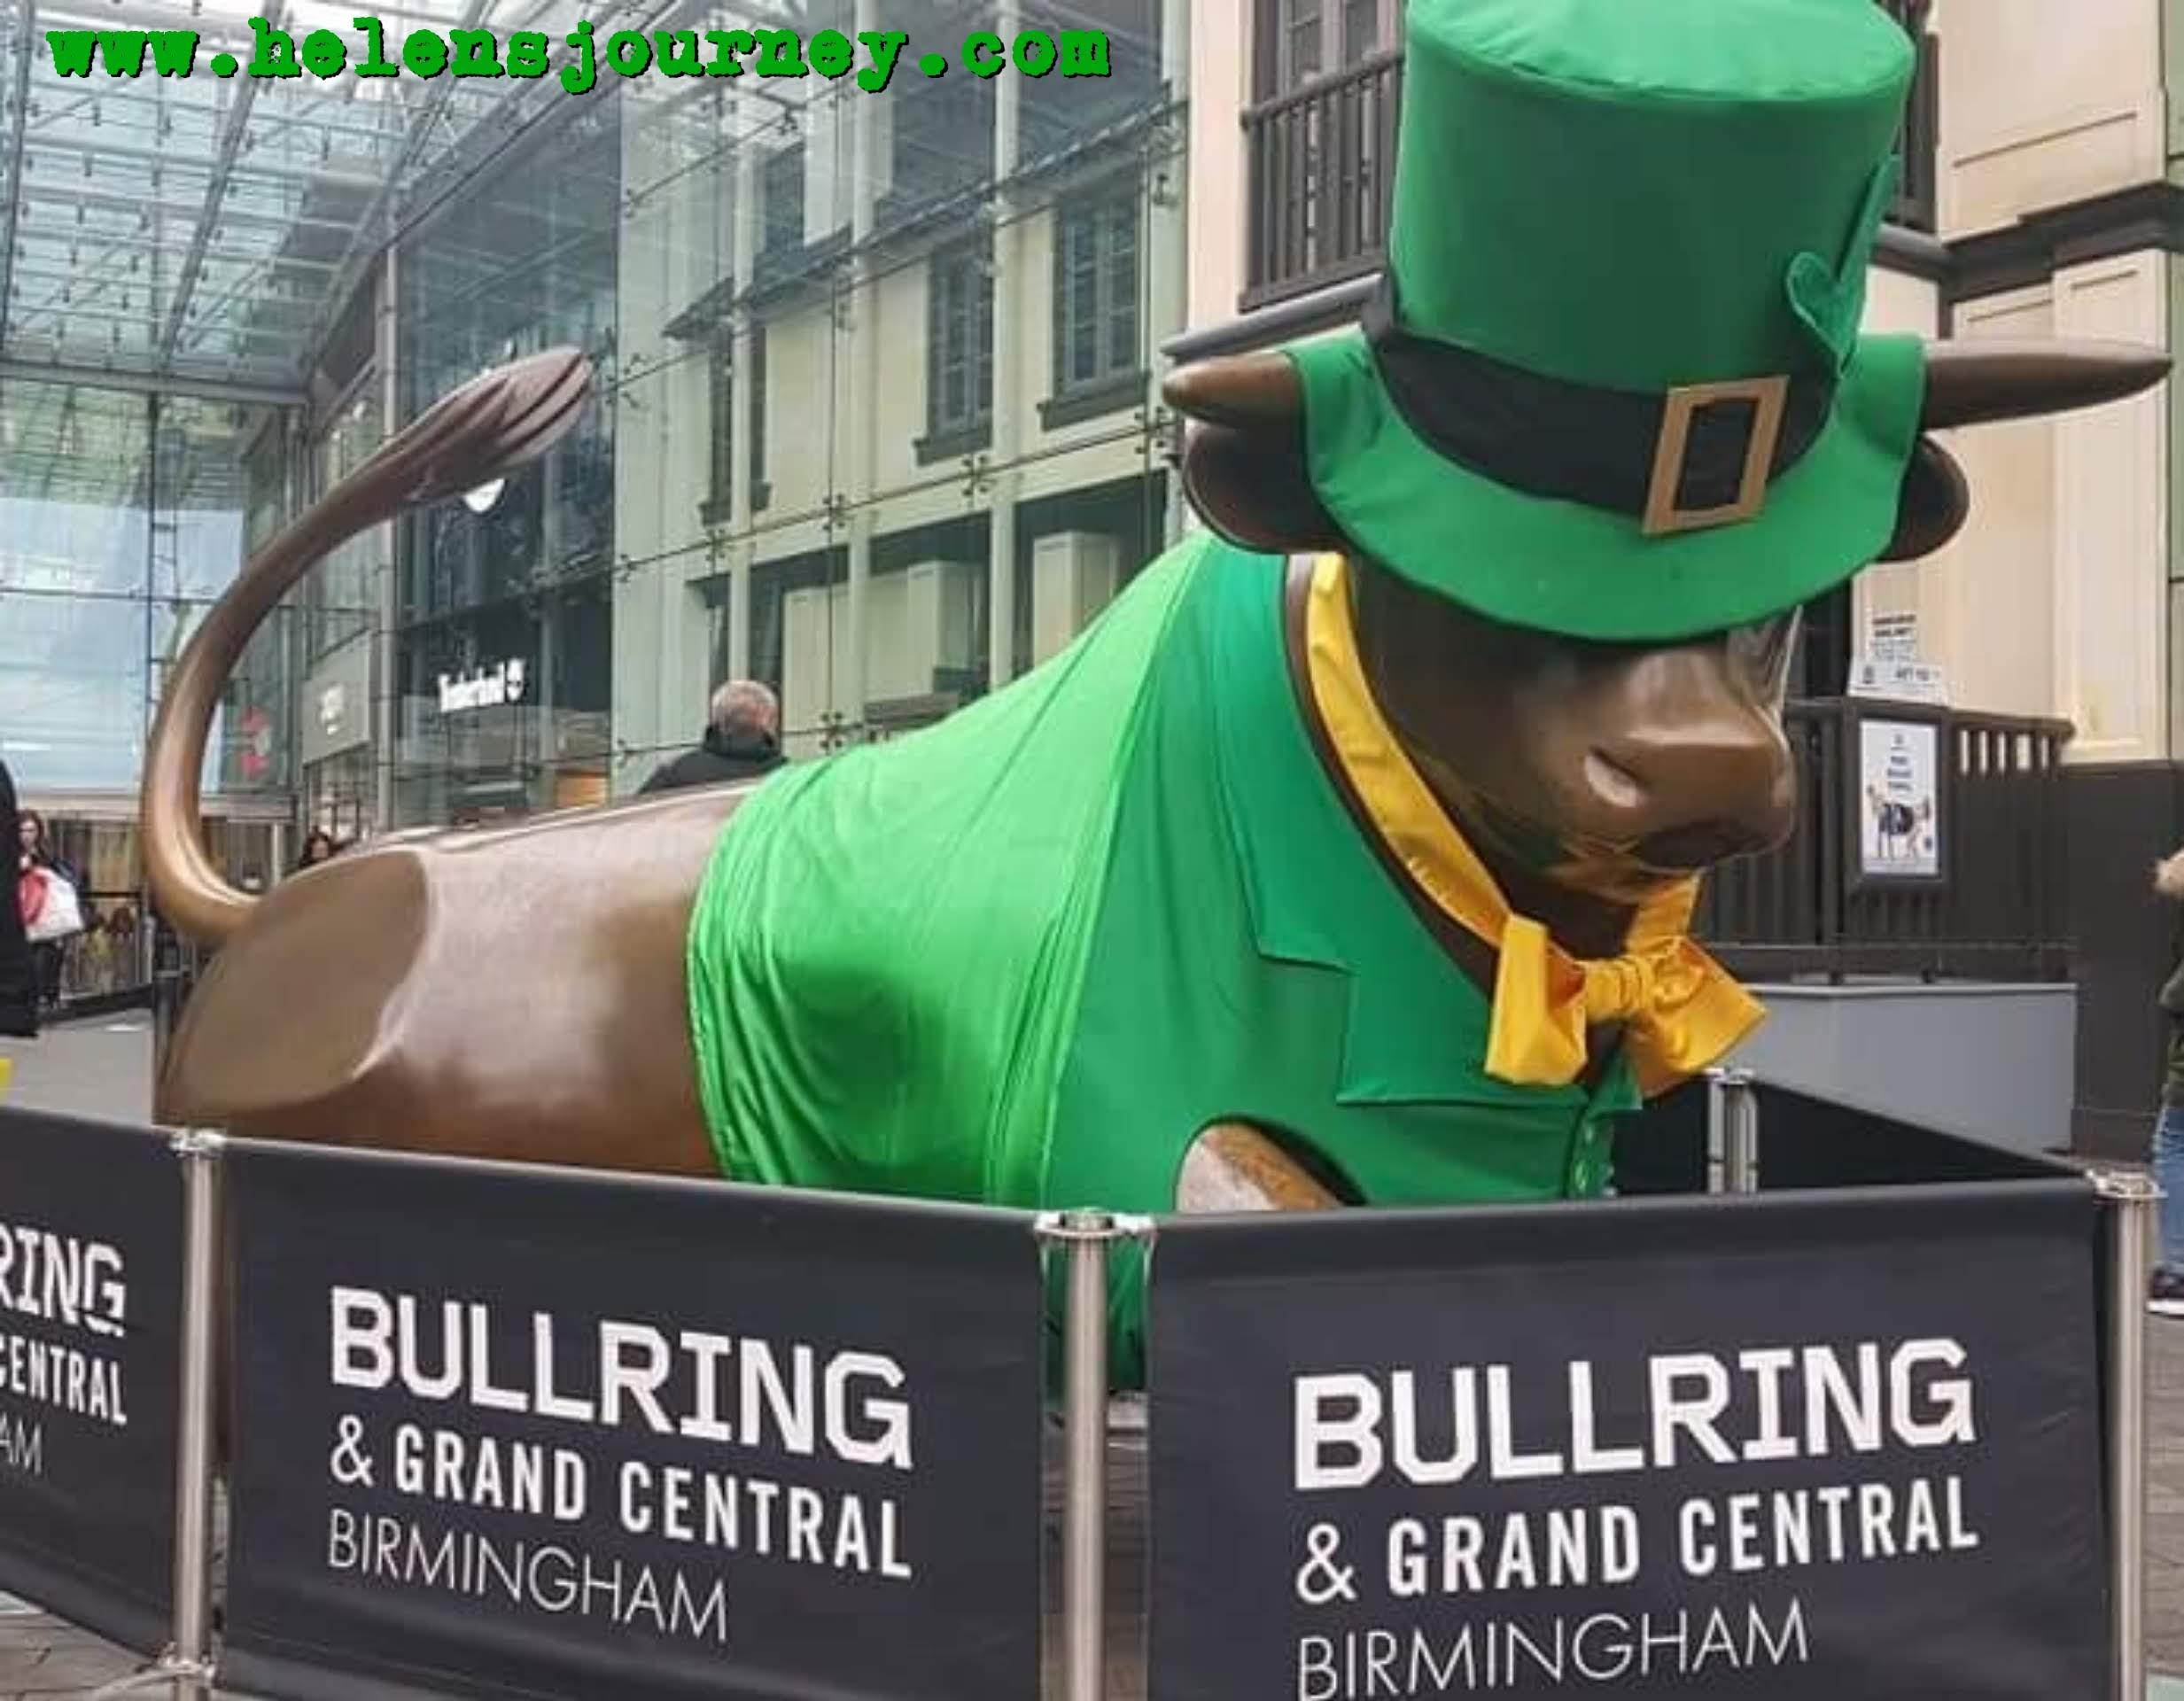 Birmingham Bull Statue at Birmingham Bullring dressed up for Saint Patricks Day as Birmingham has the 3rd biggest St Patricks Day Parade in the world